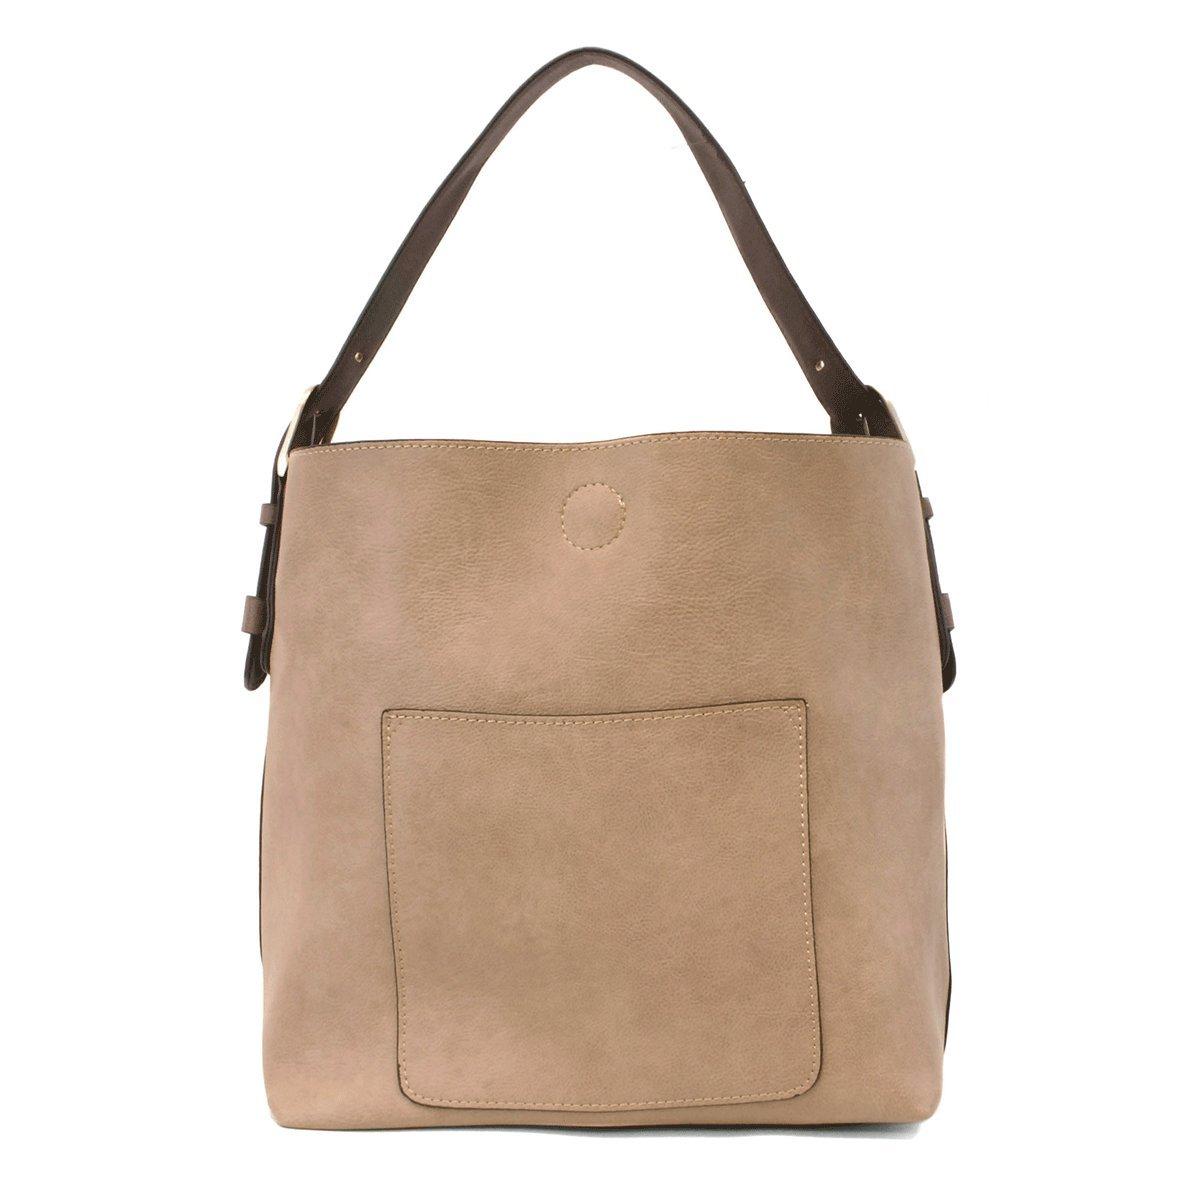 Joy Susan Classic Hobo Handbag (Heathered Grey)